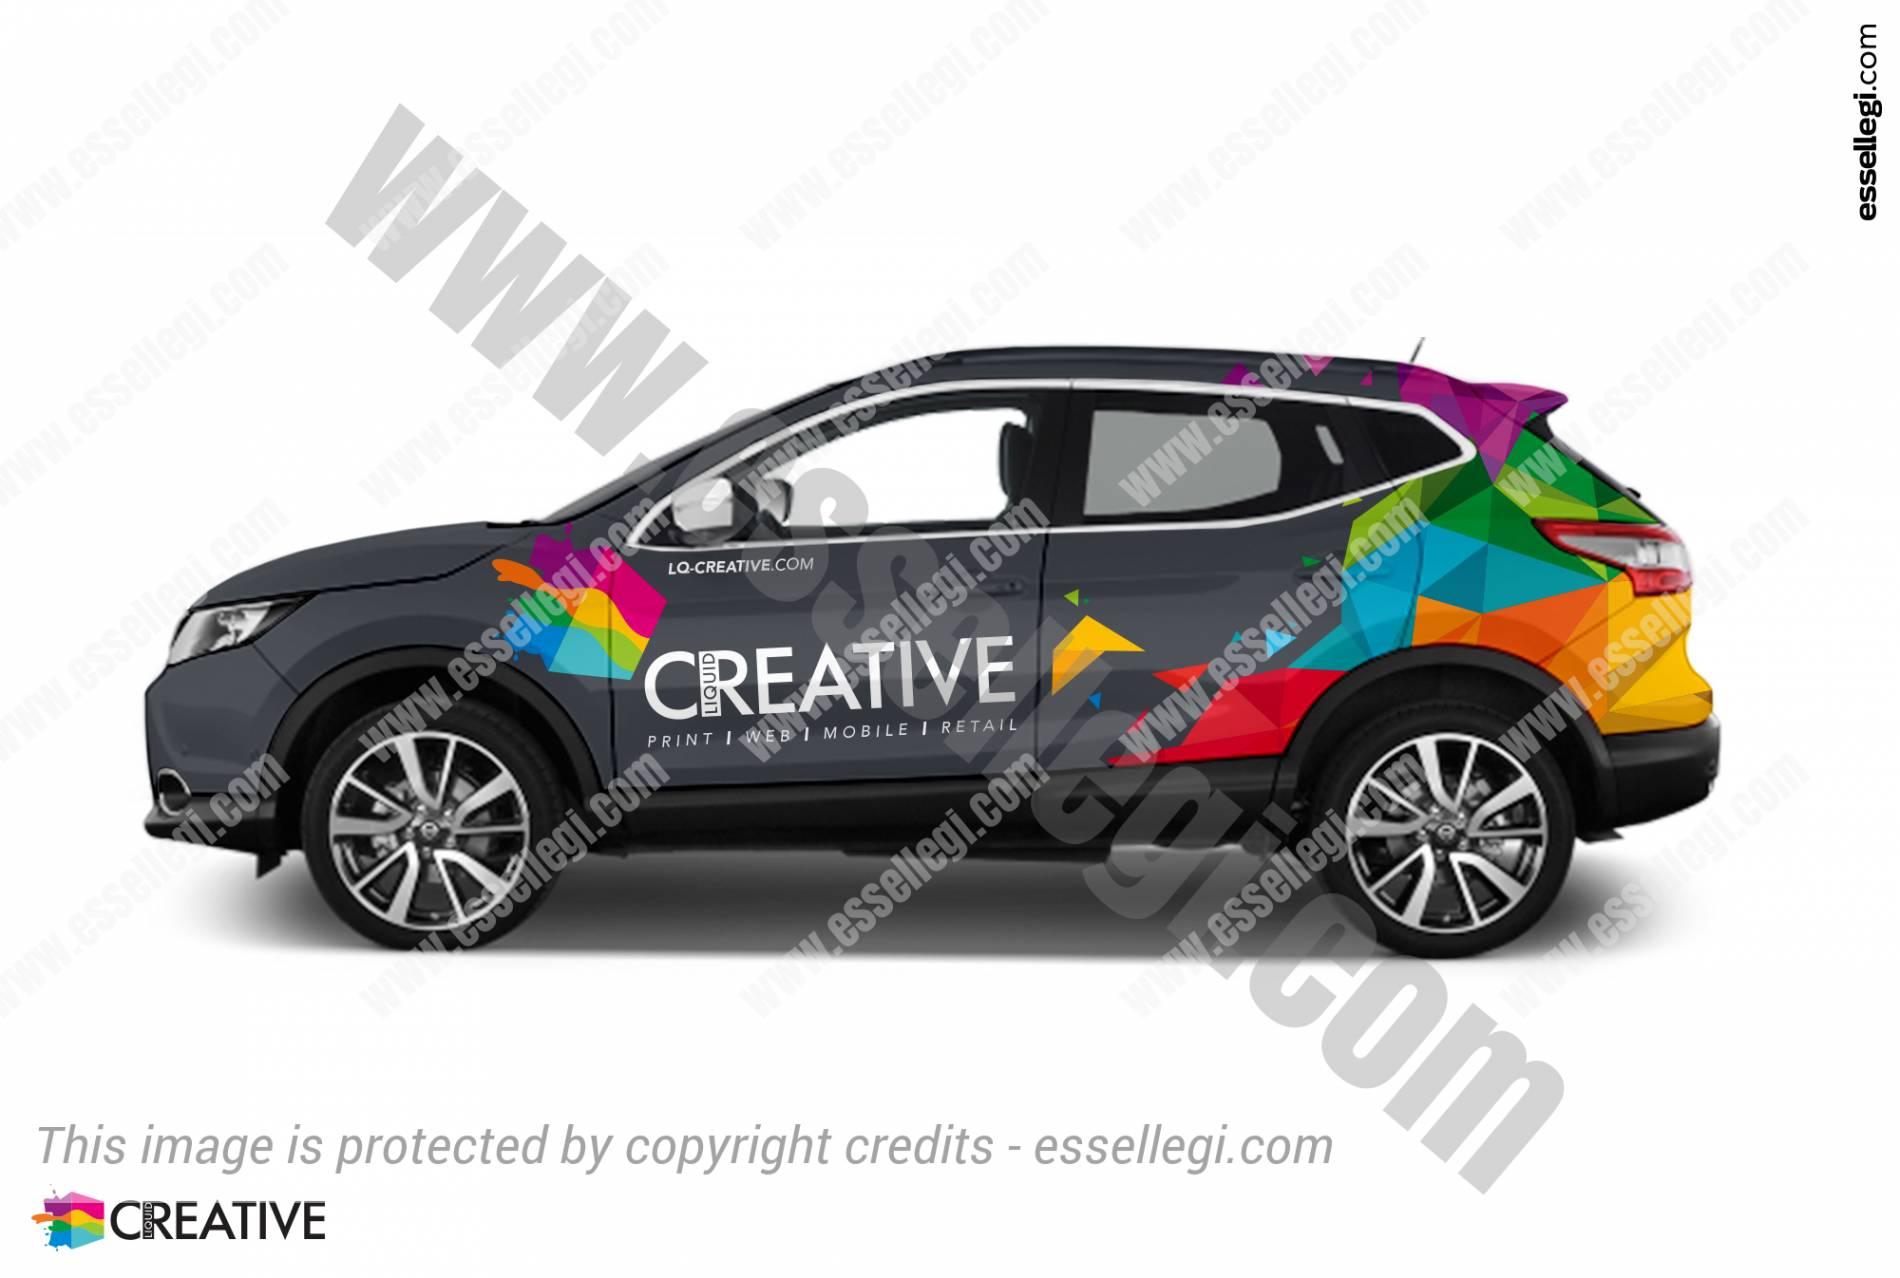 LIQUID CREATIVE | CAR WRAP DESIGN 🇬🇧